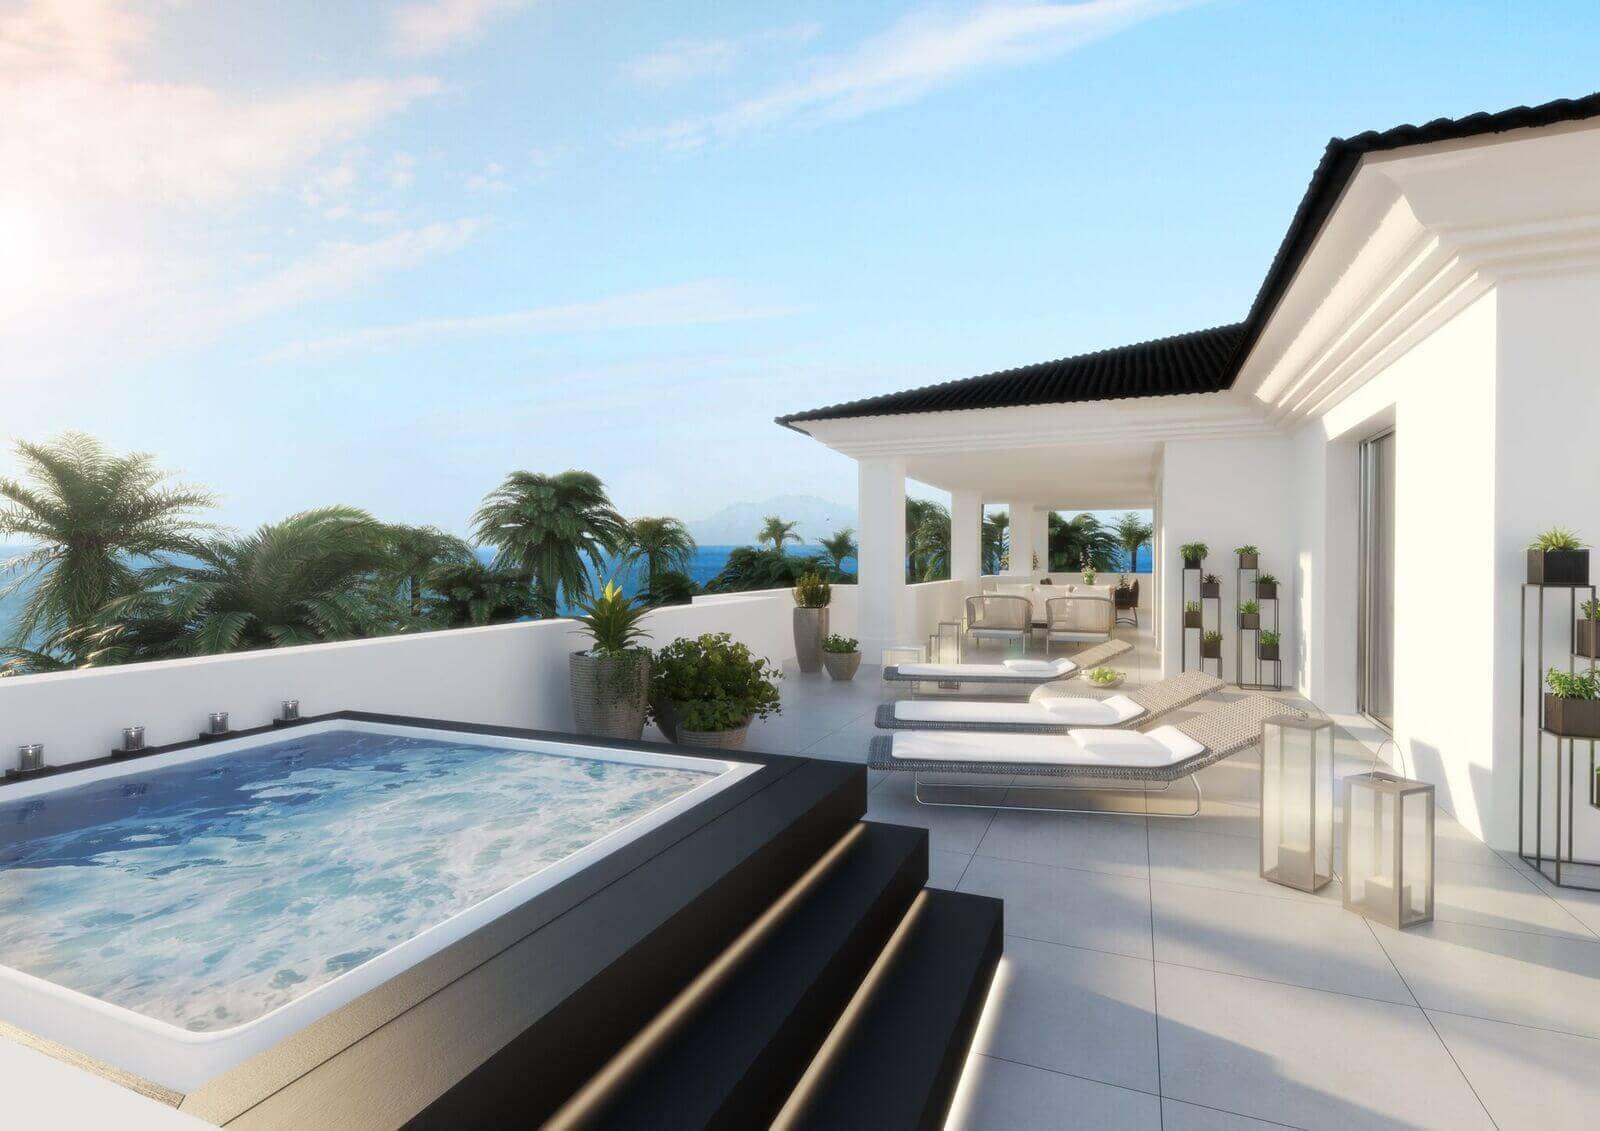 mirador de estepona new golden mile appartement penthpuse te koop marbella jacuzzi terras